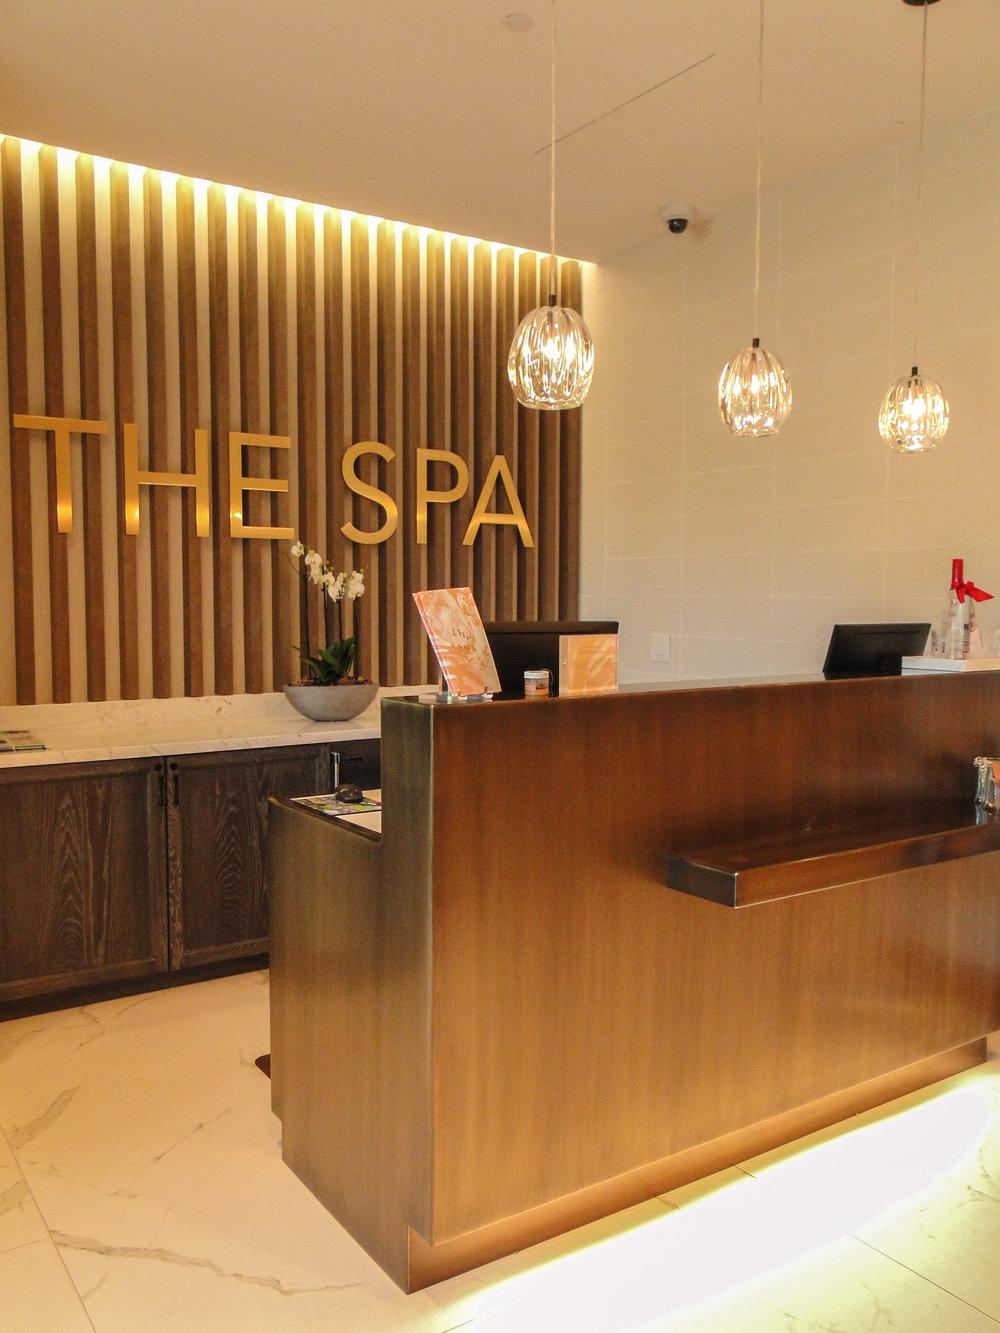 Four Seasons - The Spa